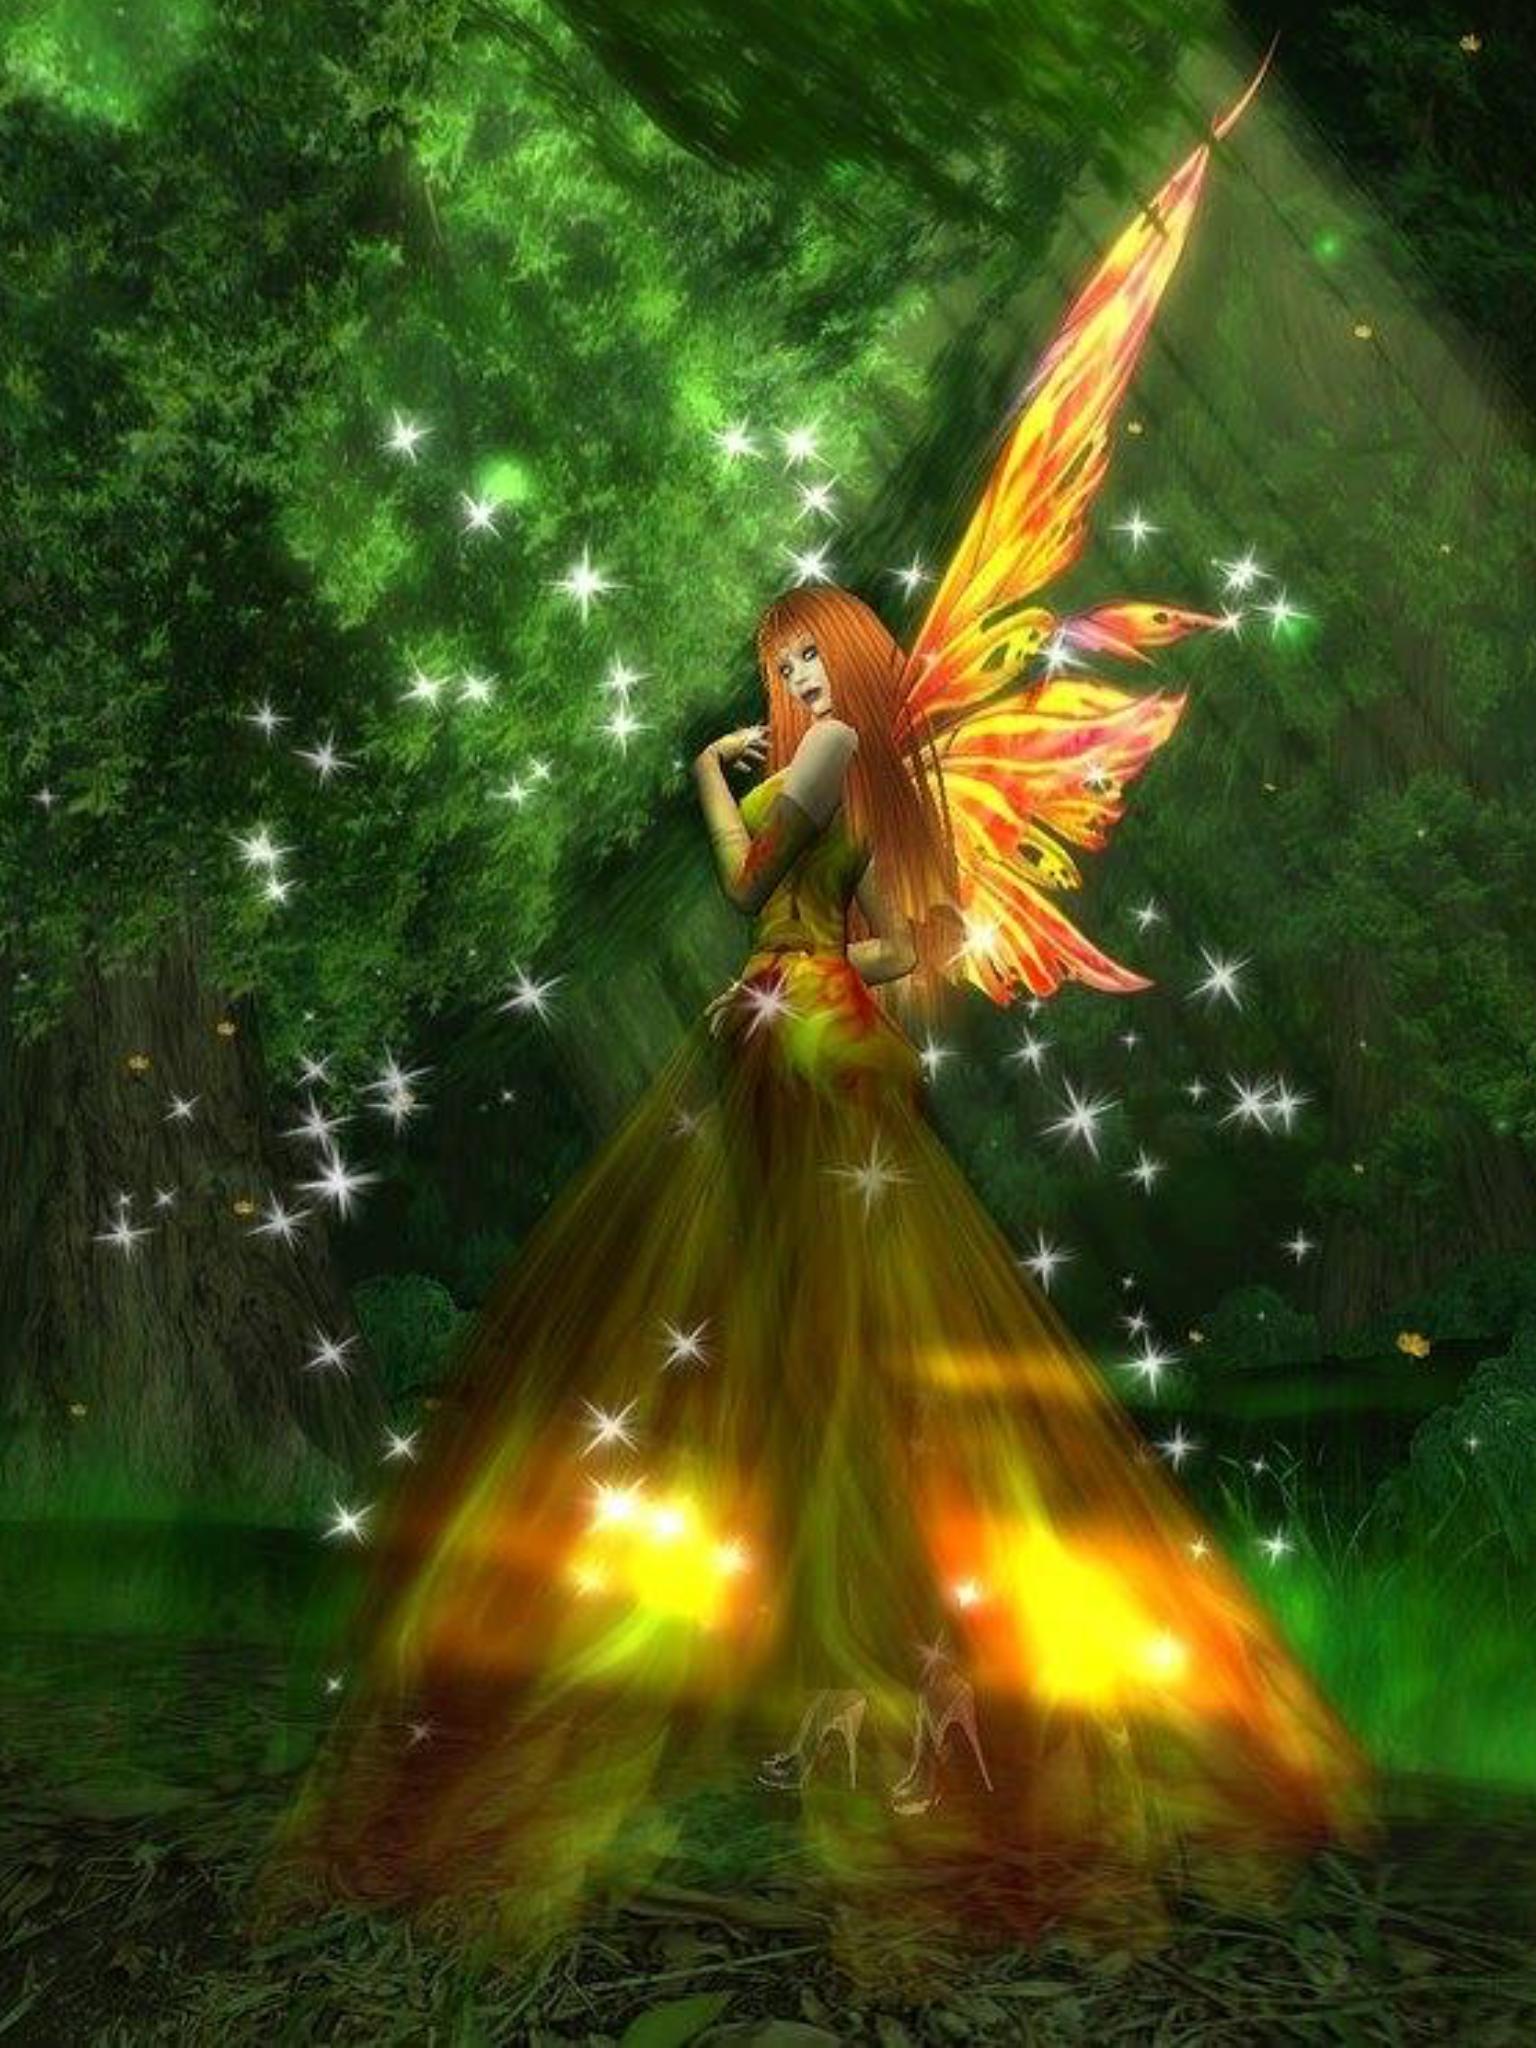 Pin By Krista Meek On Fantasy Art Divas Fairies Angels Vampires Warriors Fairy Artwork Fairy Wallpaper Beautiful Fairies